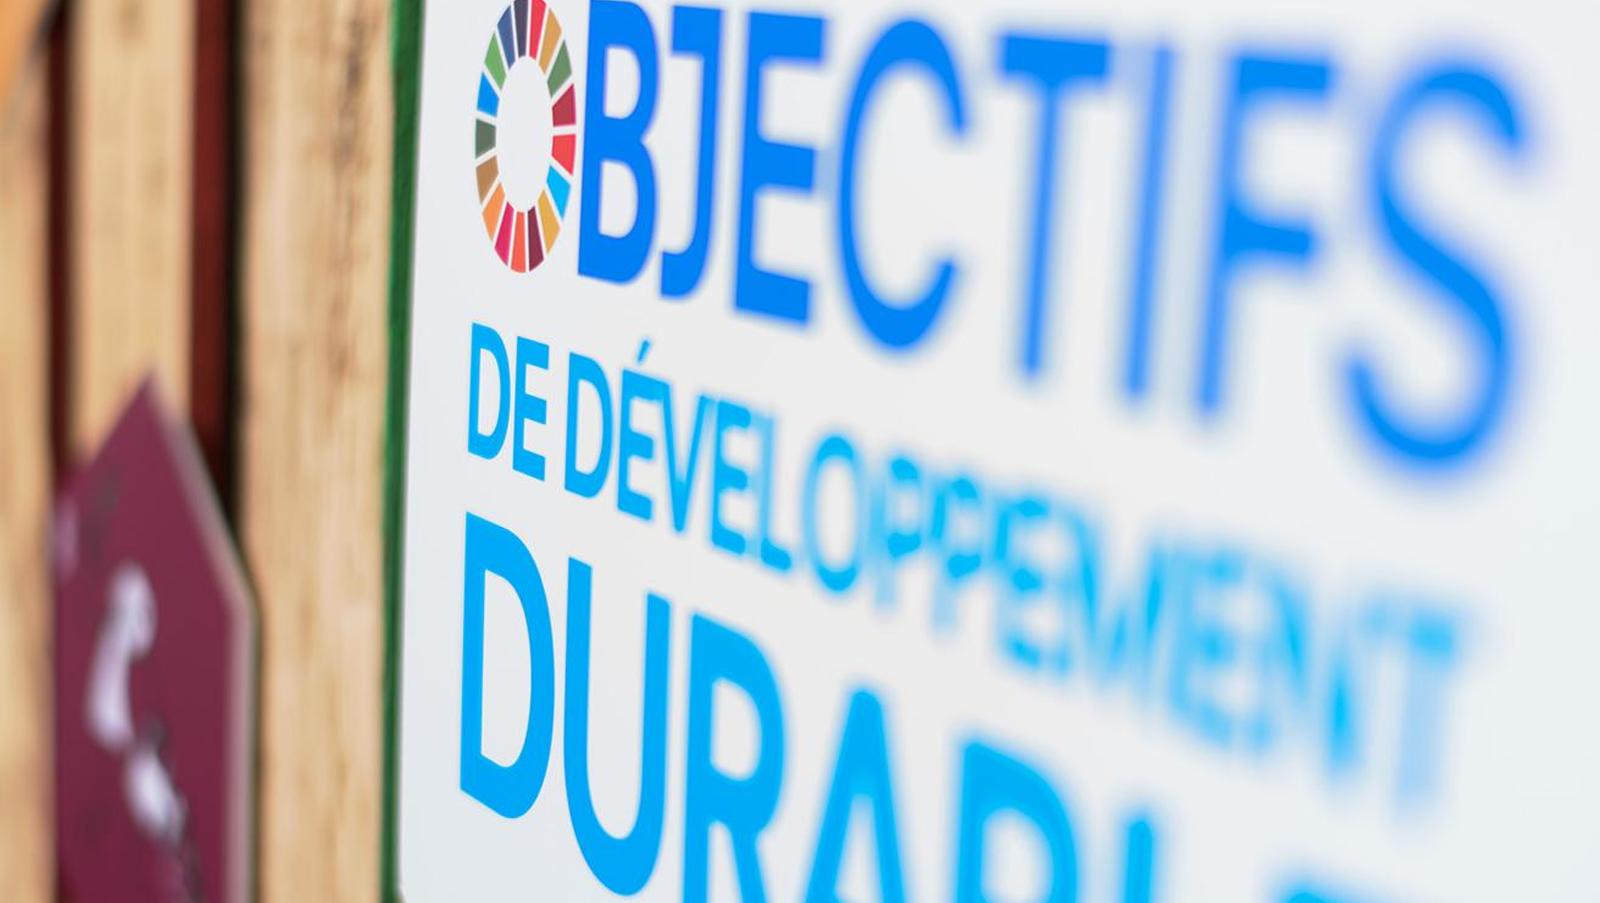 Partnering for Progress: How Real-time Social Data Advances the SDGs